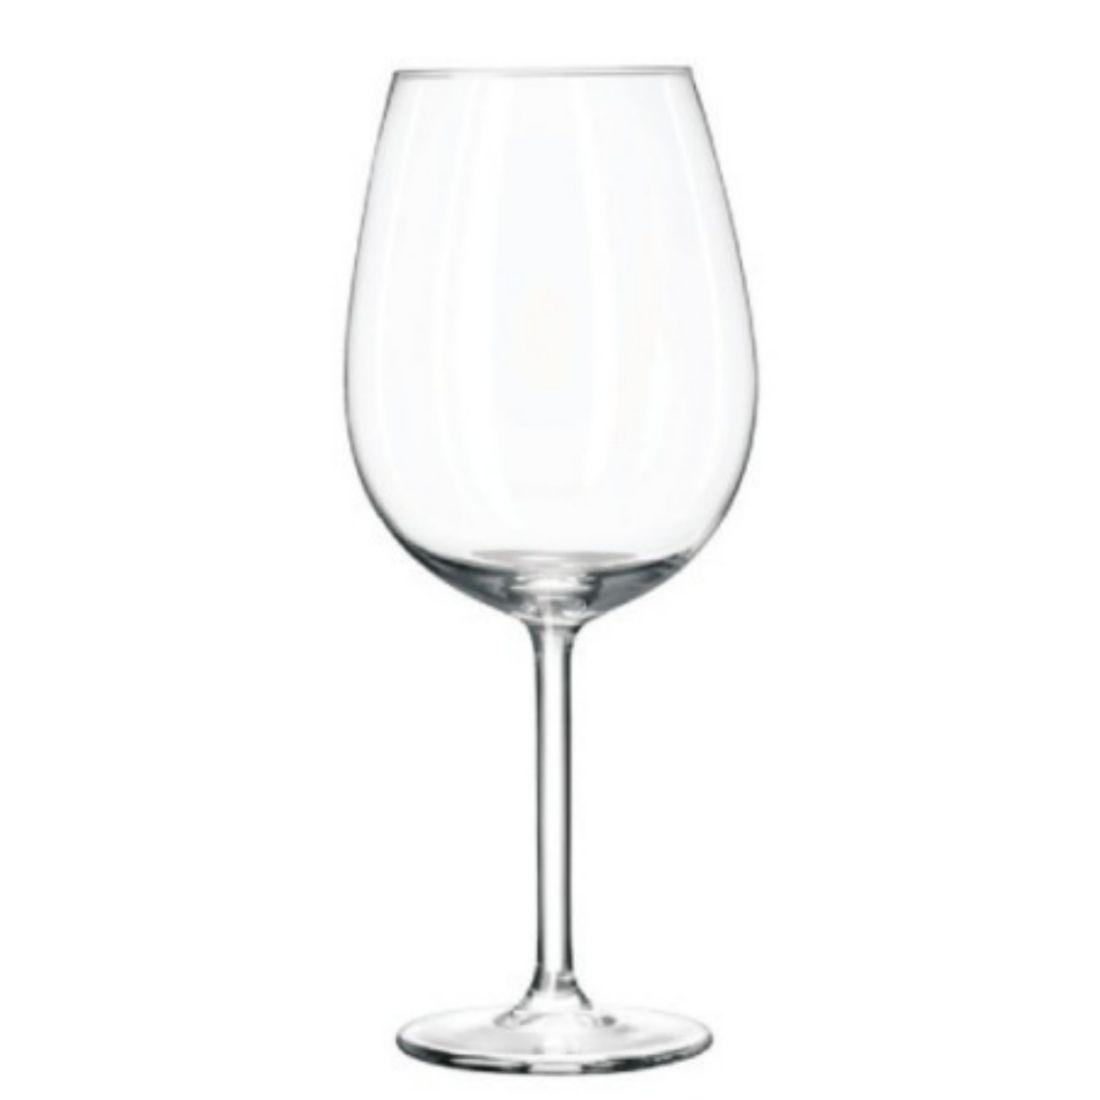 Banquet, sklenička XXL 73 cl